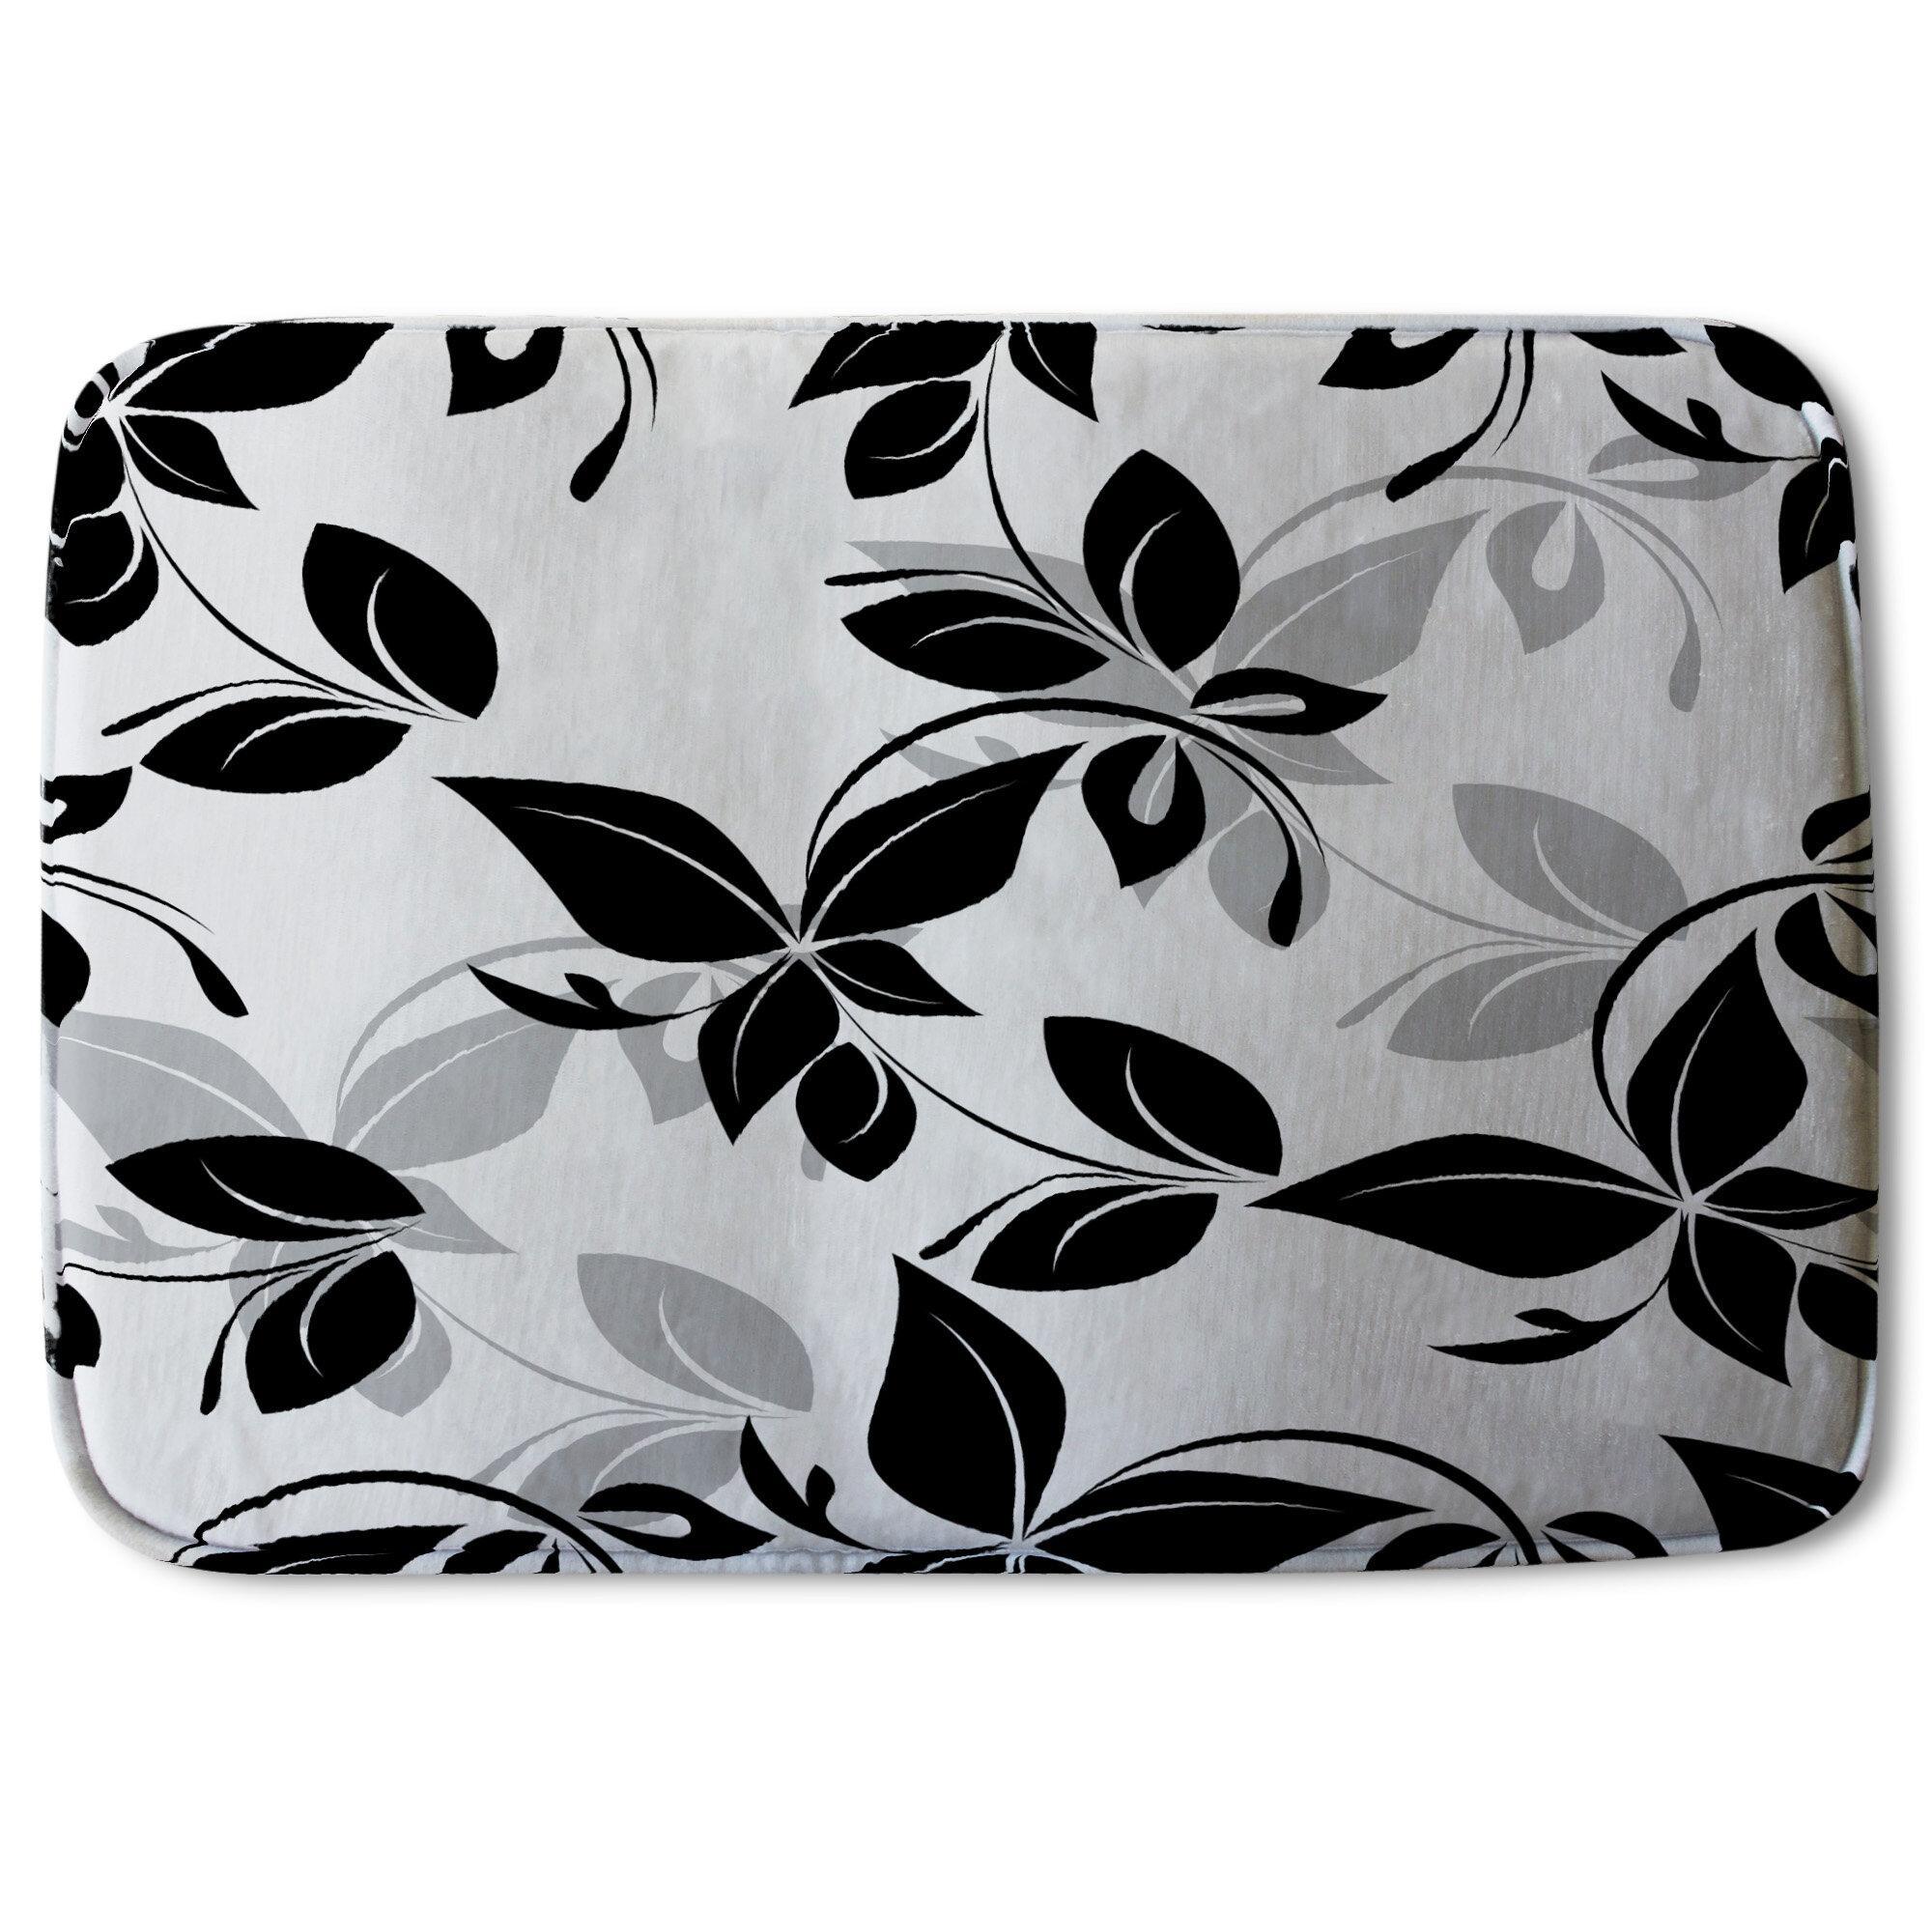 Black Nature Floral Bath Rugs Mats You Ll Love In 2021 Wayfair